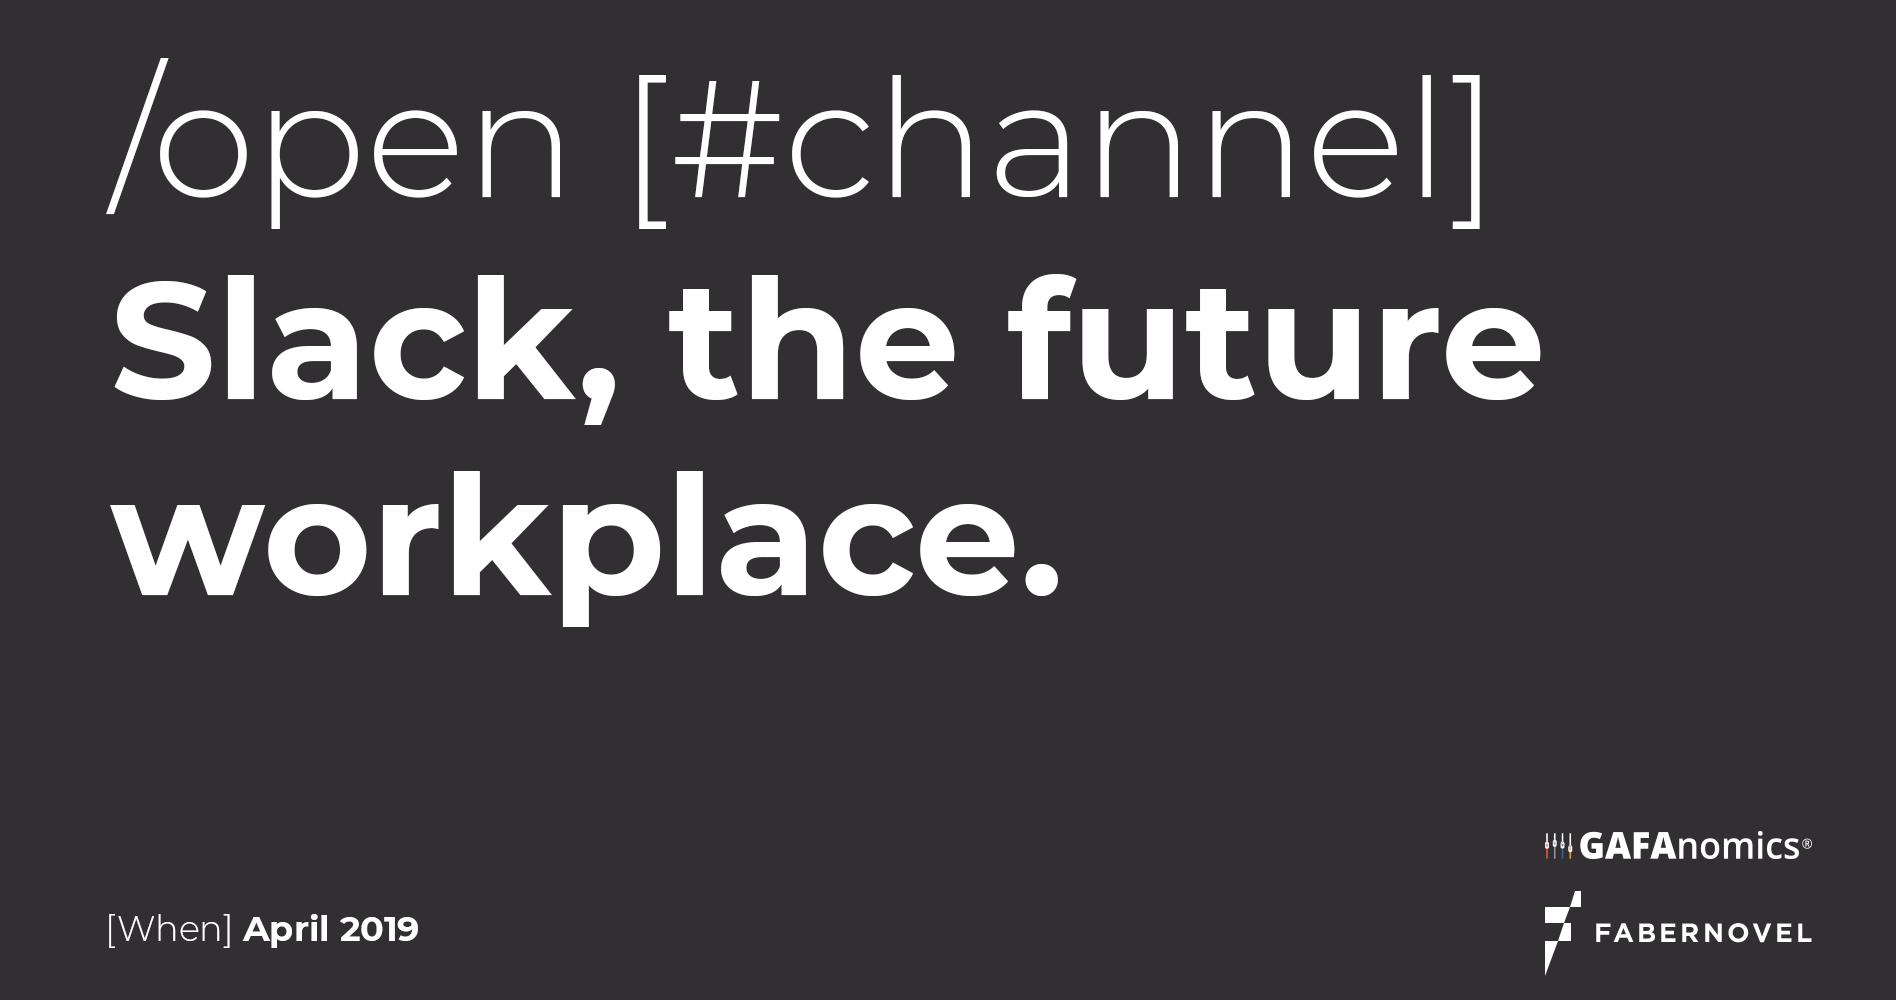 Slack, the future workplace